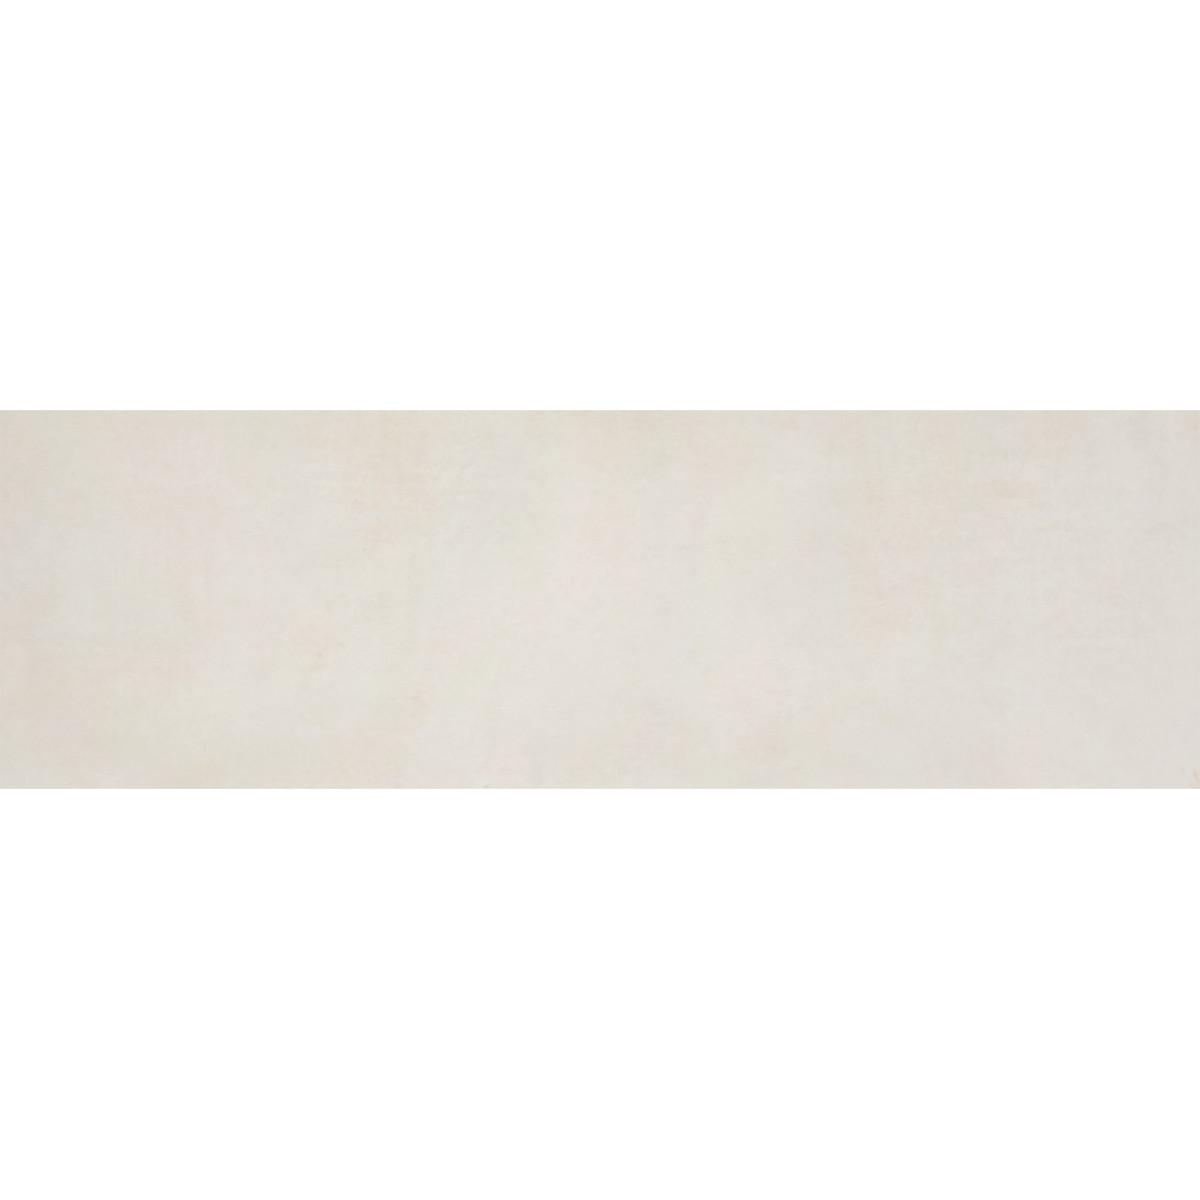 Плитка настенная Cersanit Ravenna 19.8х59.8 см 1.08 м² цвет бежевый